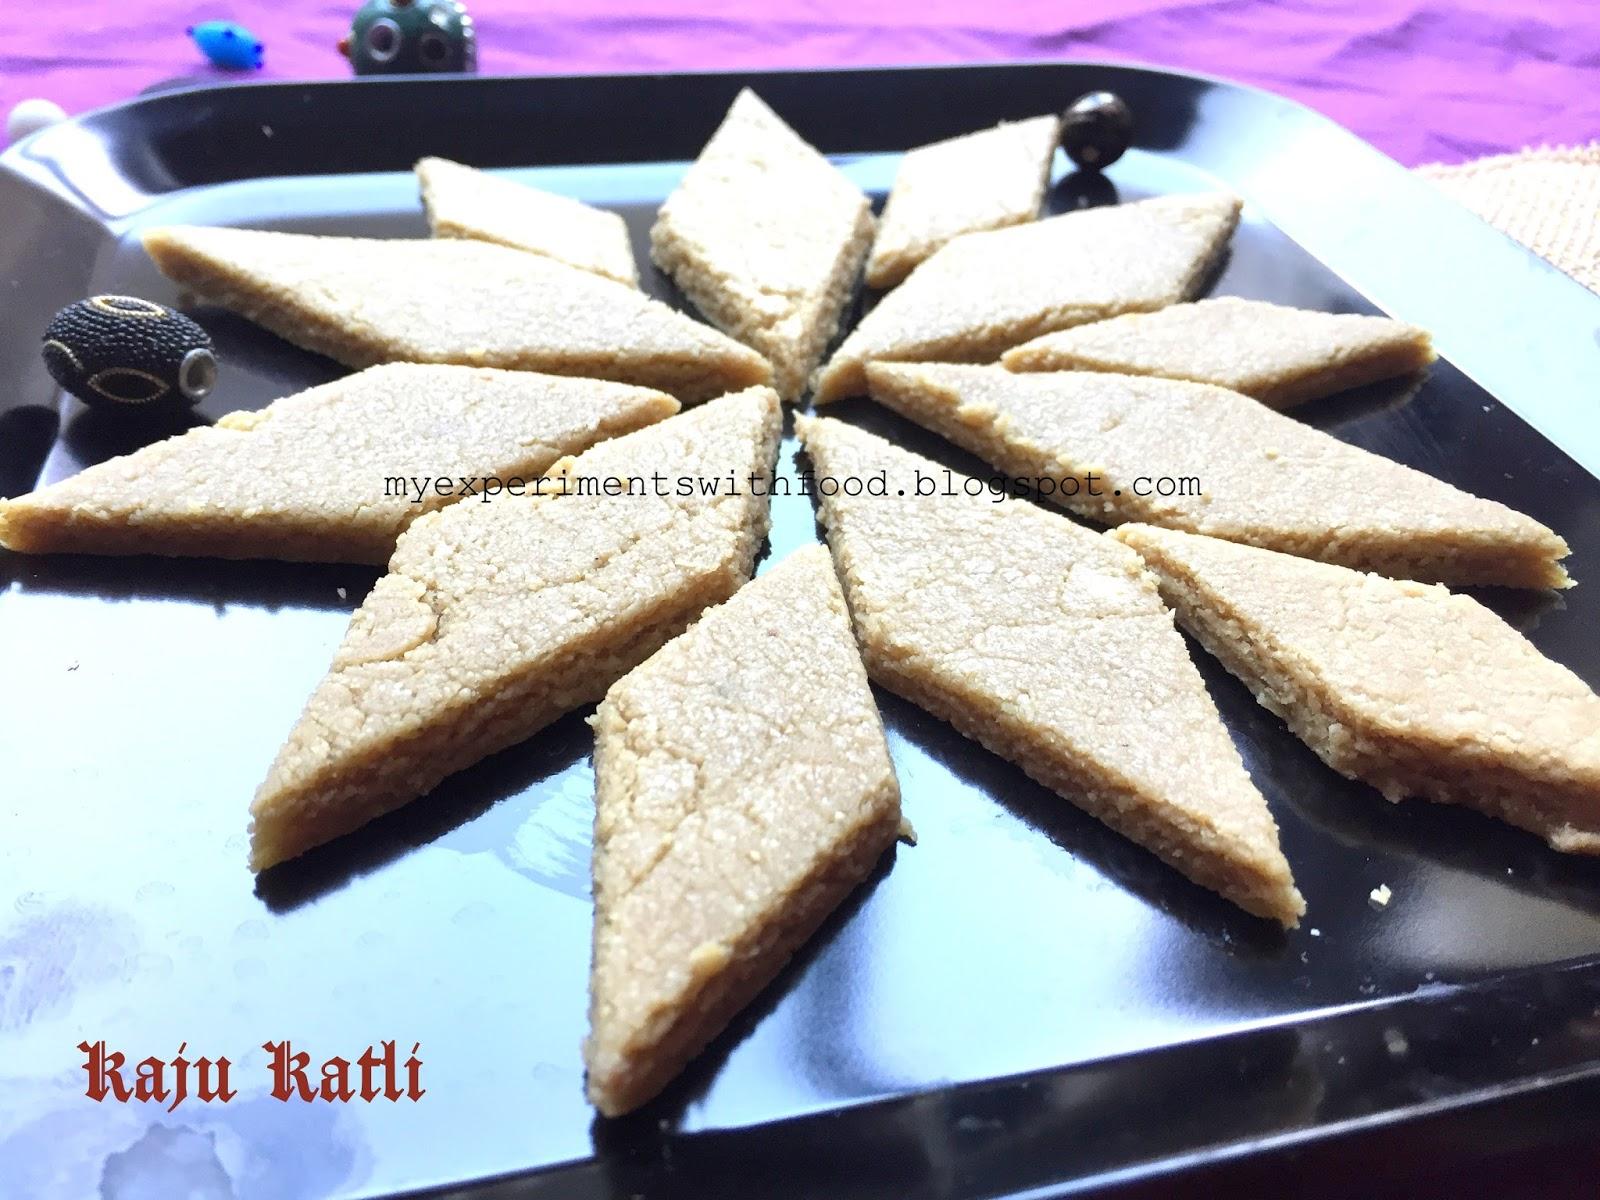 Mysore pak sweet shop in bangalore dating 5